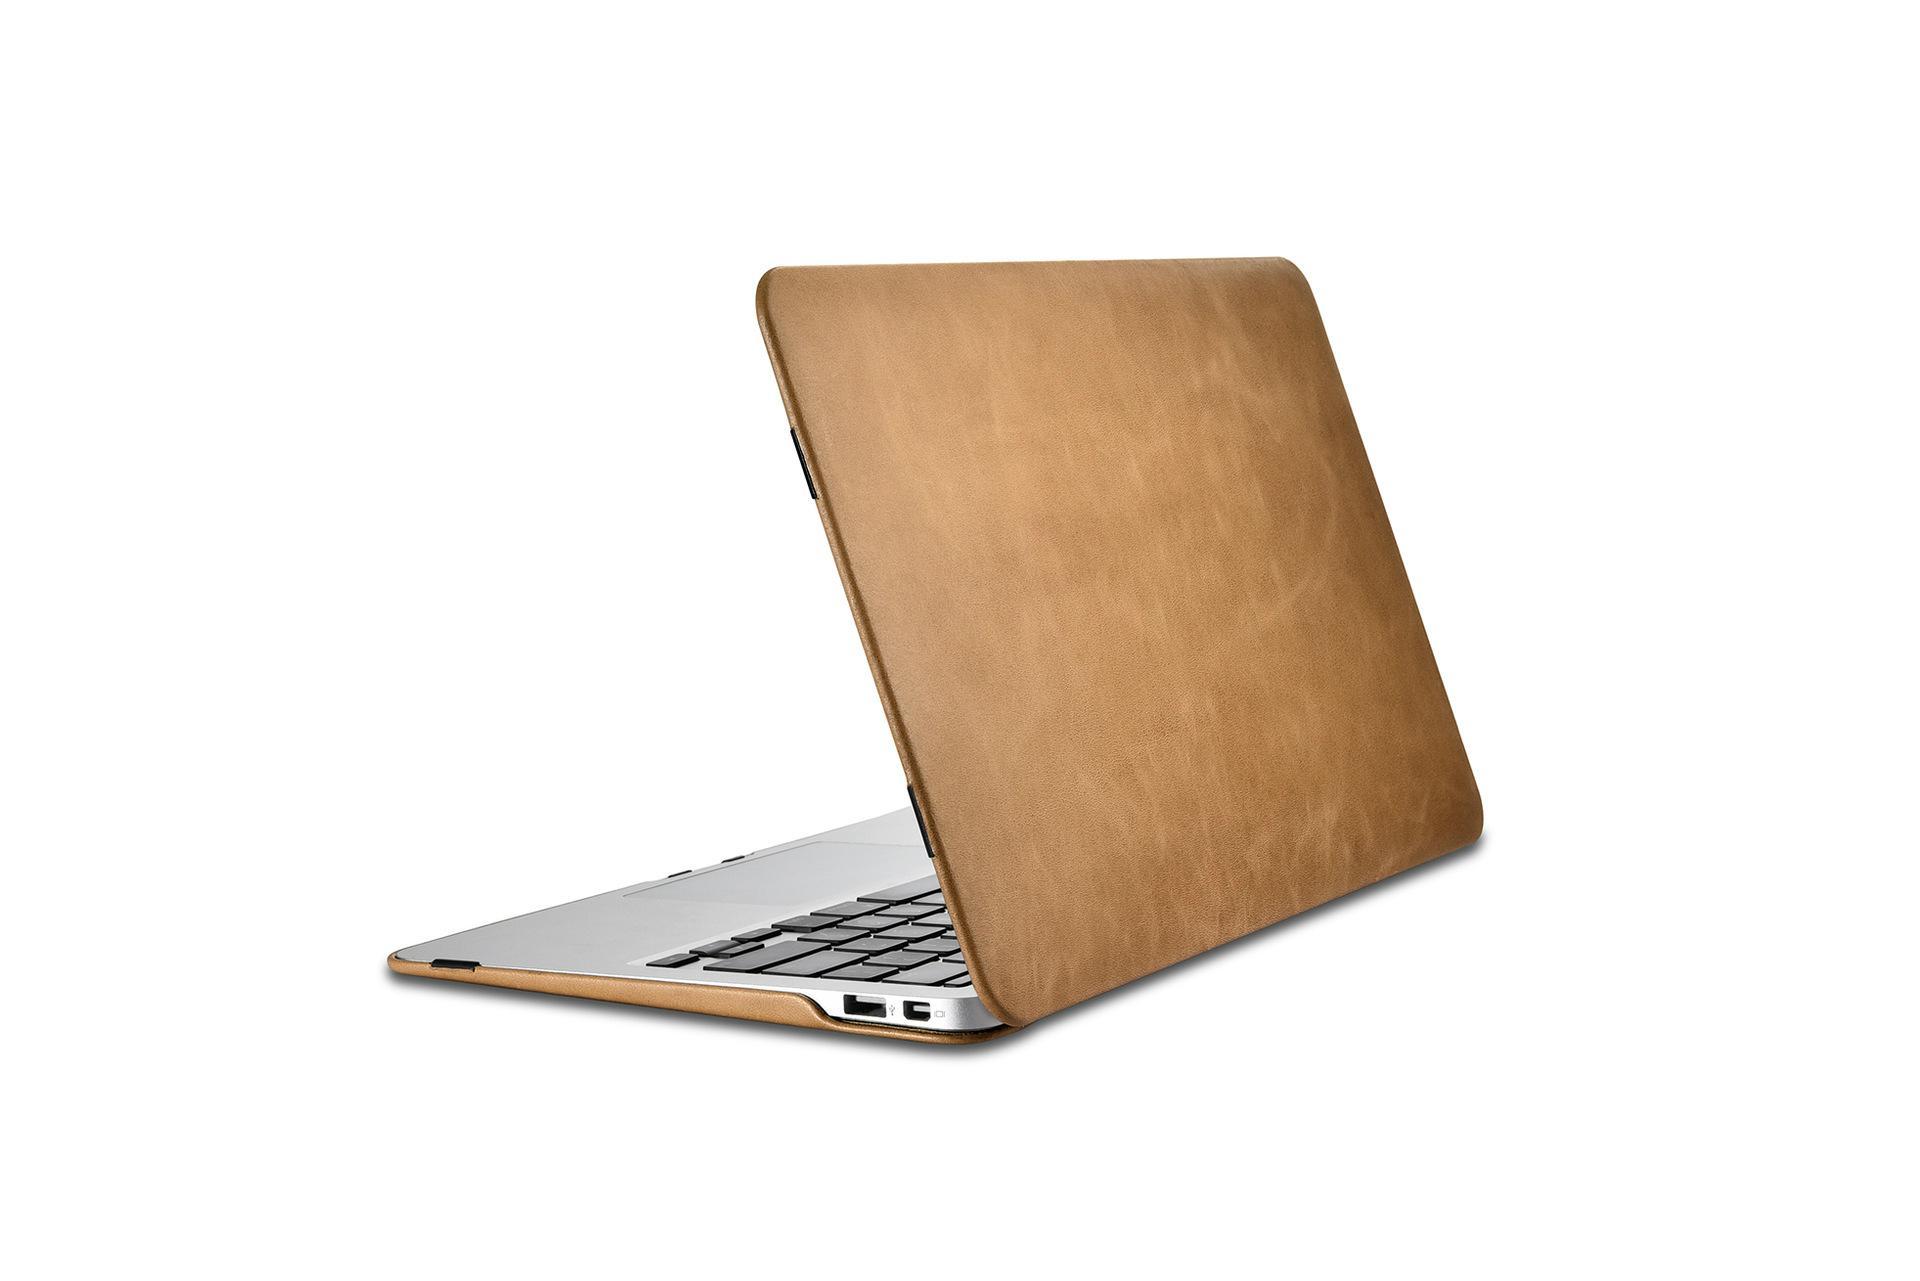 iCarer MacBook Air 11 inch Vintage Book Style Slim Folio Case 11